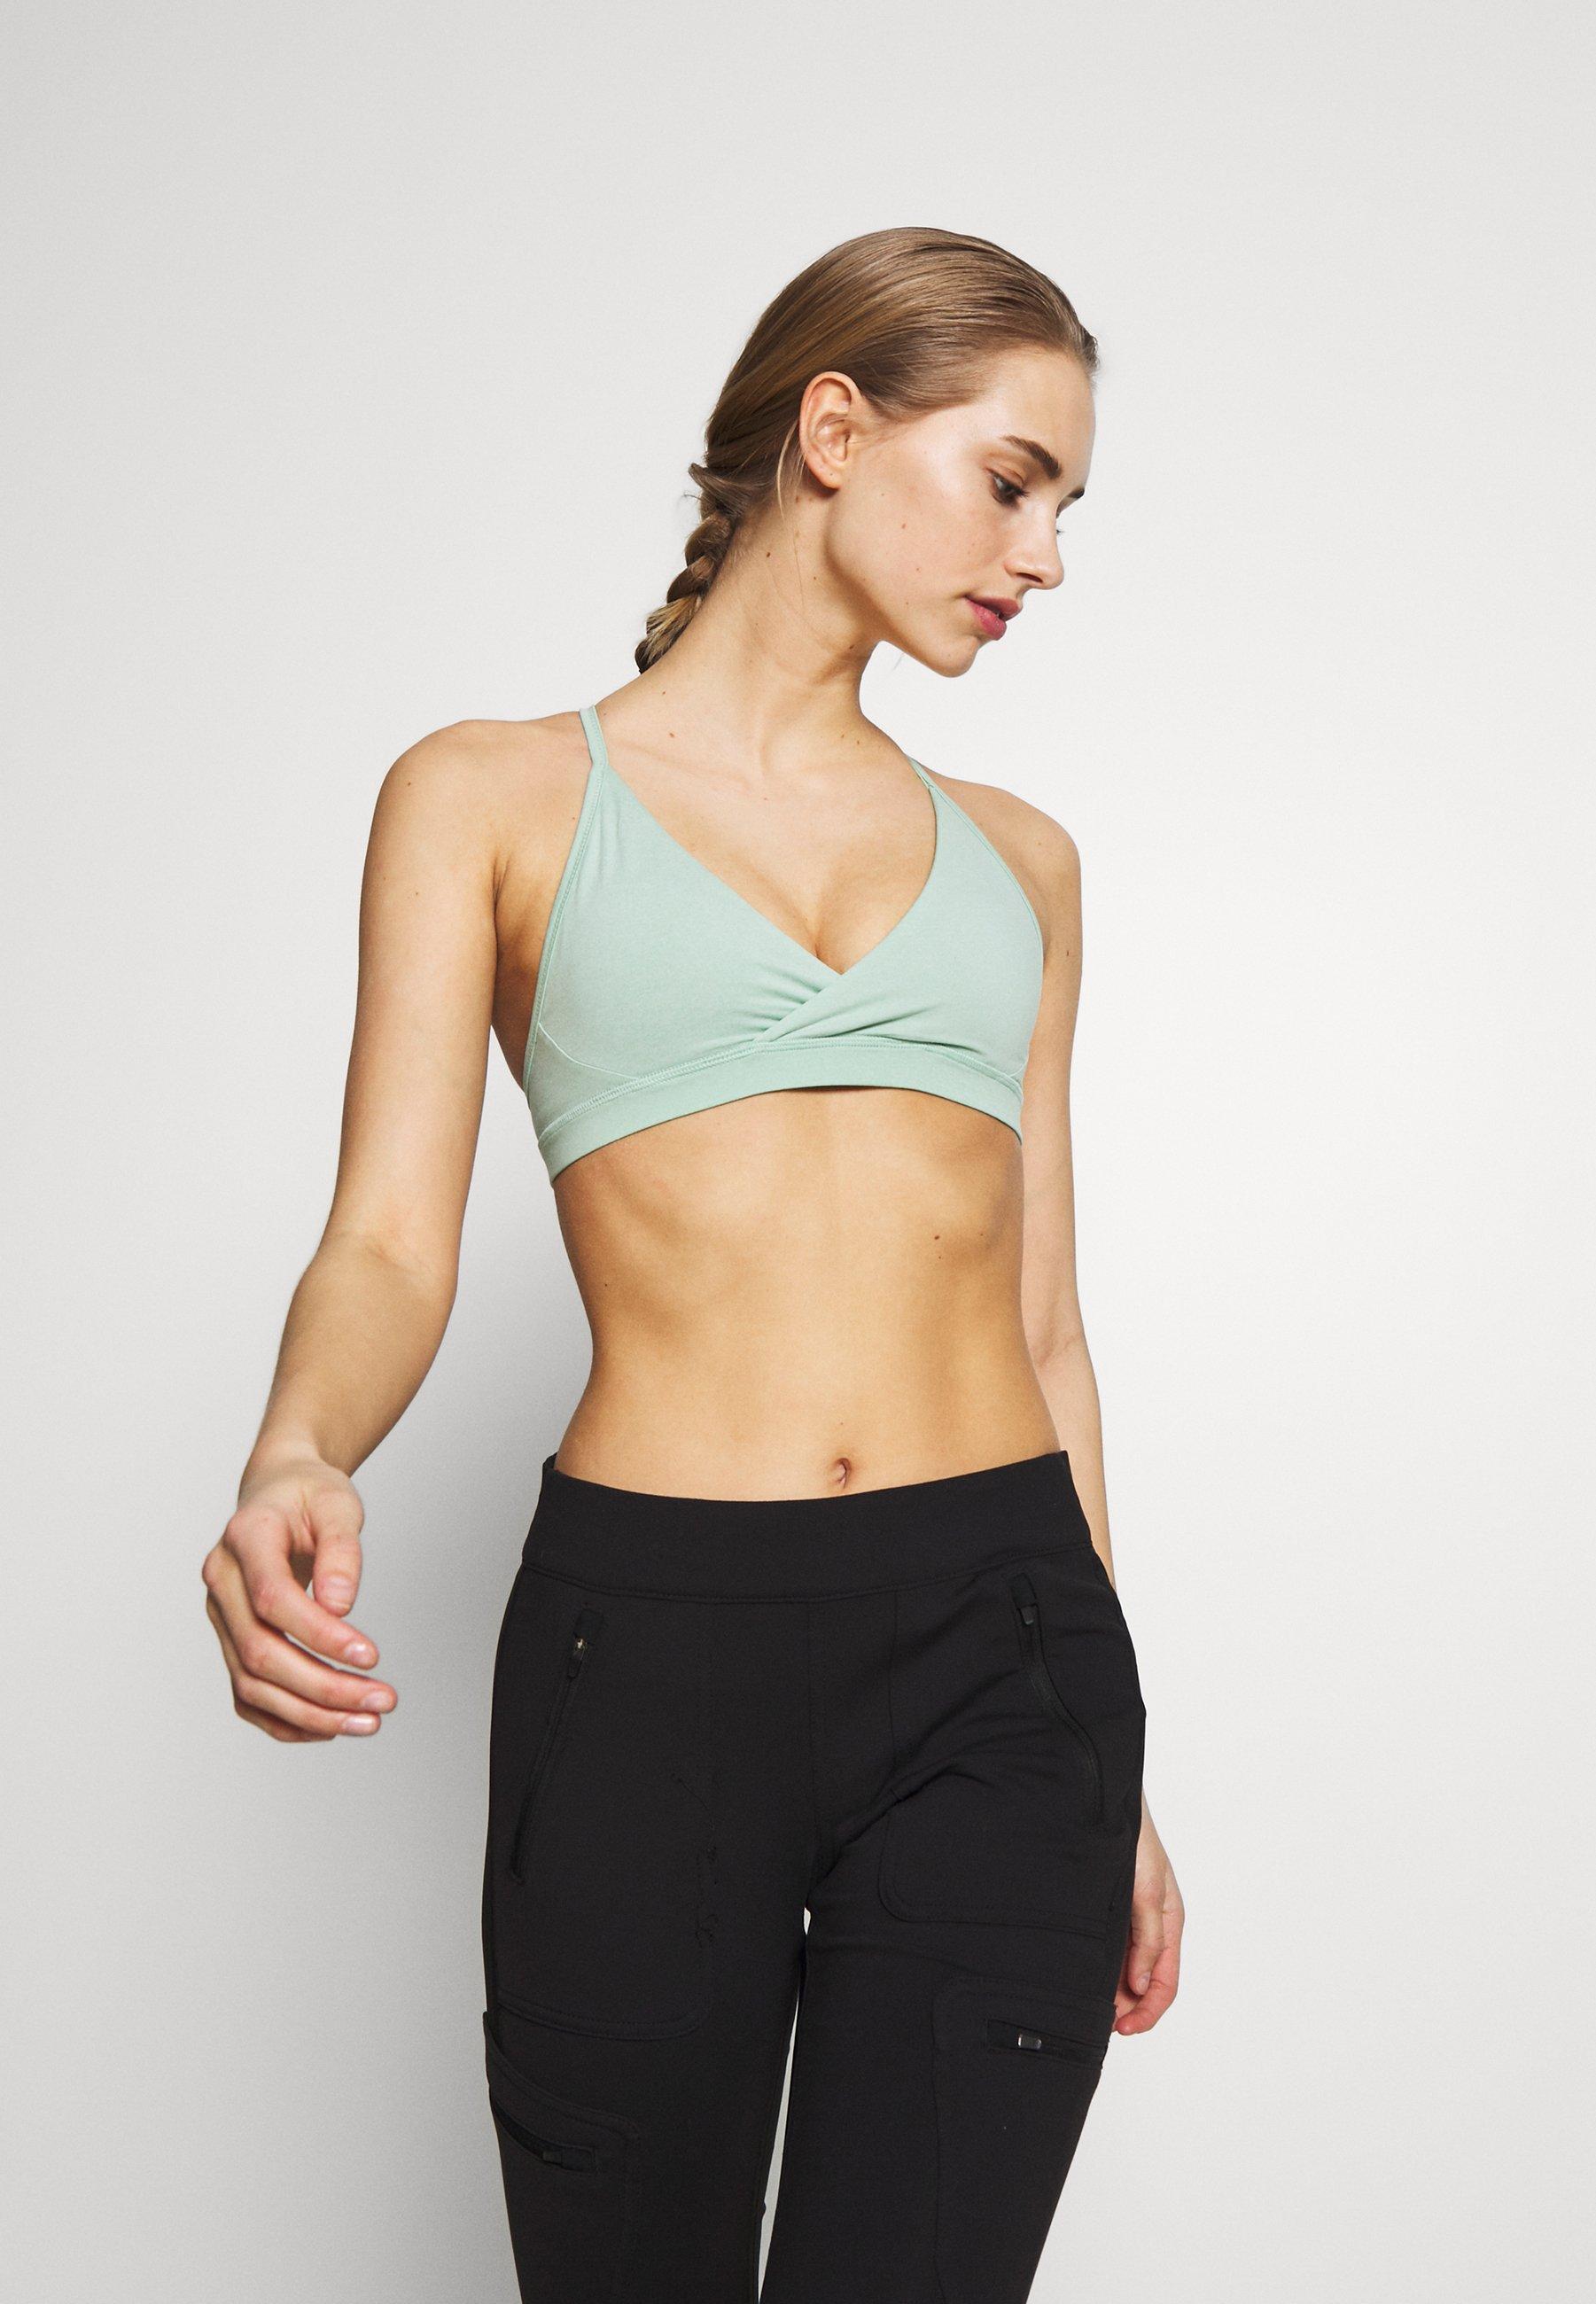 Women CROSS BETA BRA - Light support sports bra